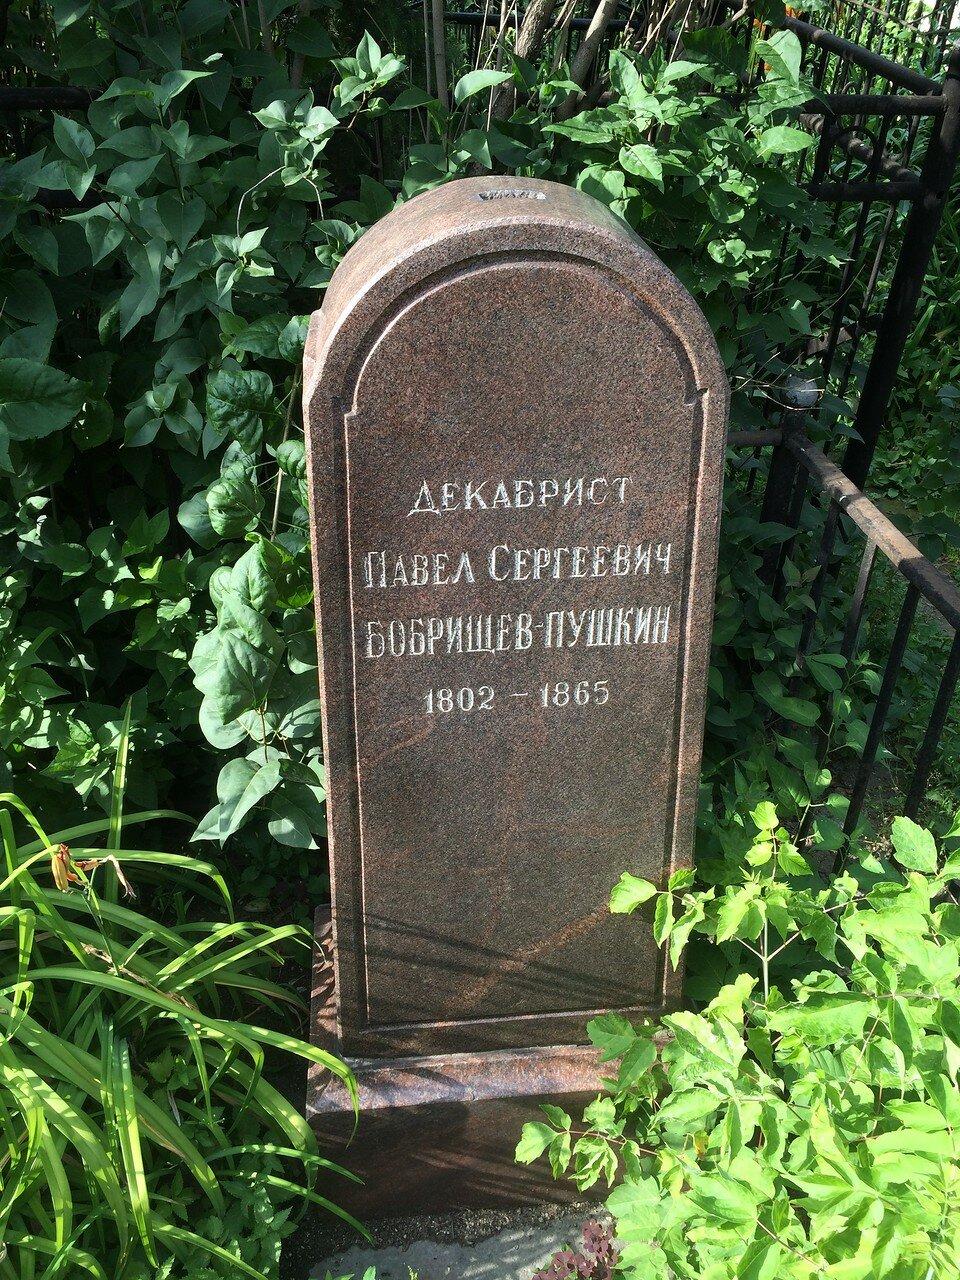 https://img-fotki.yandex.ru/get/931857/199368979.18f/0_26eb87_5e382739_XXXL.jpg